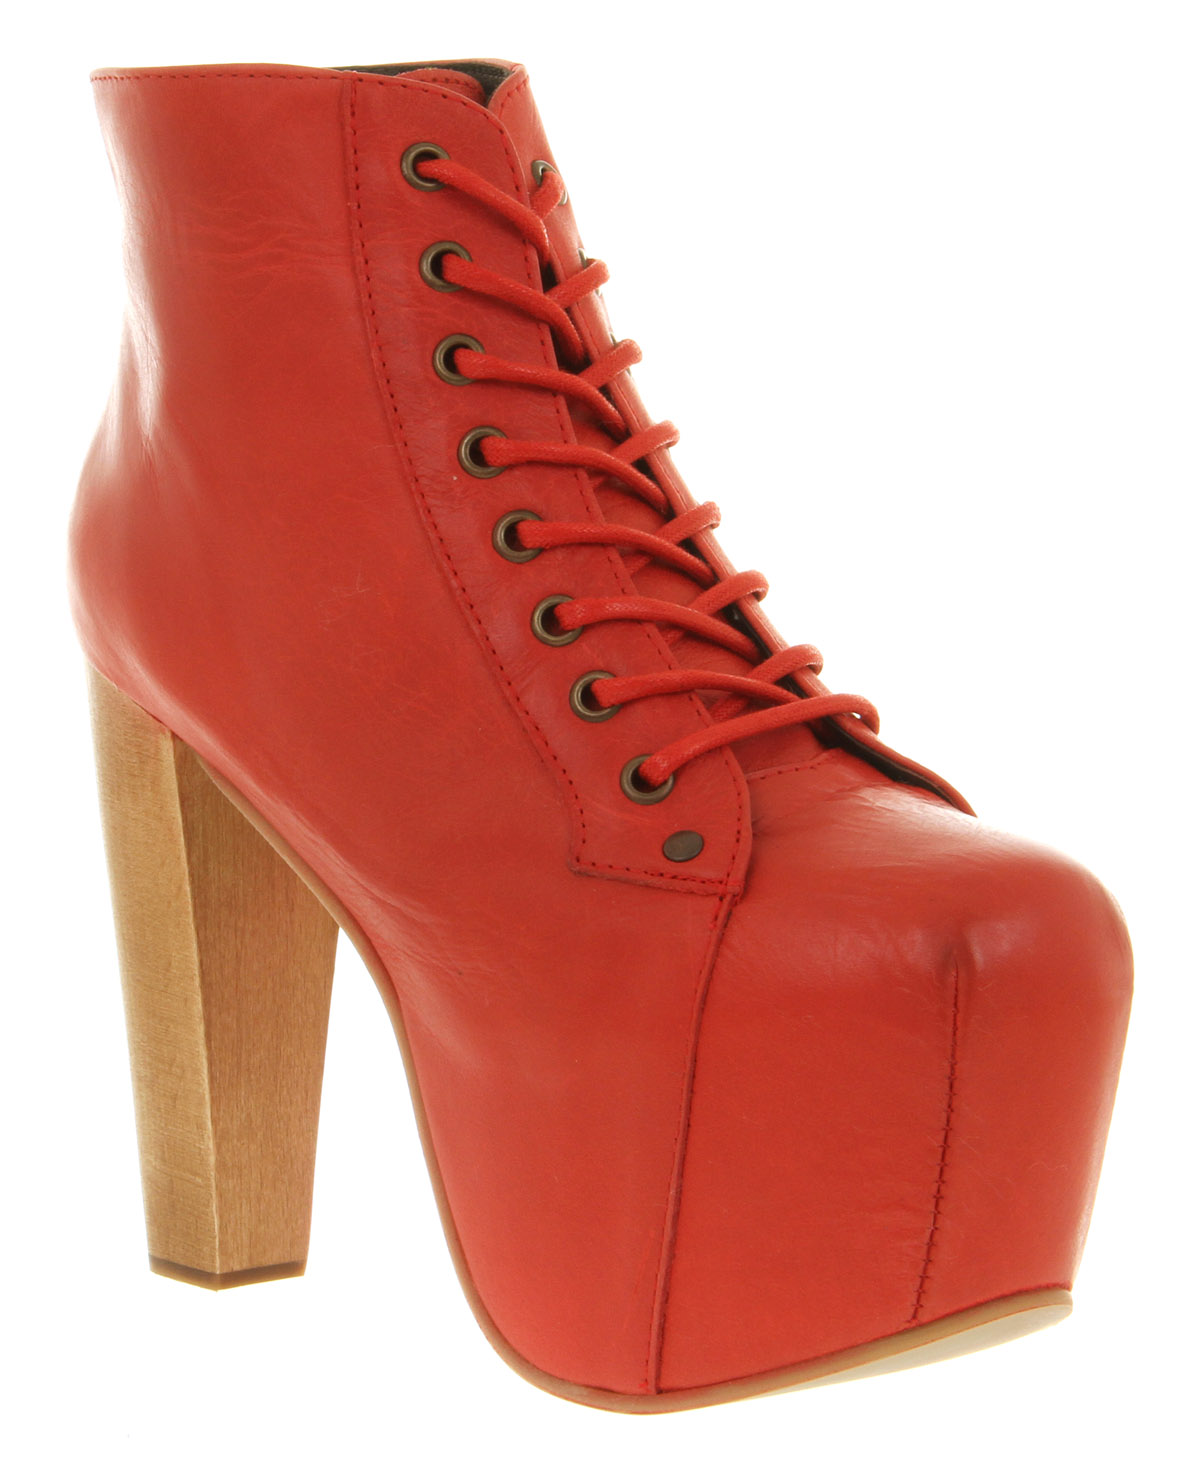 Jeffrey campbell lita platform ankle boot red leather in red lyst - Jeffrey campbell lita platform boots ...